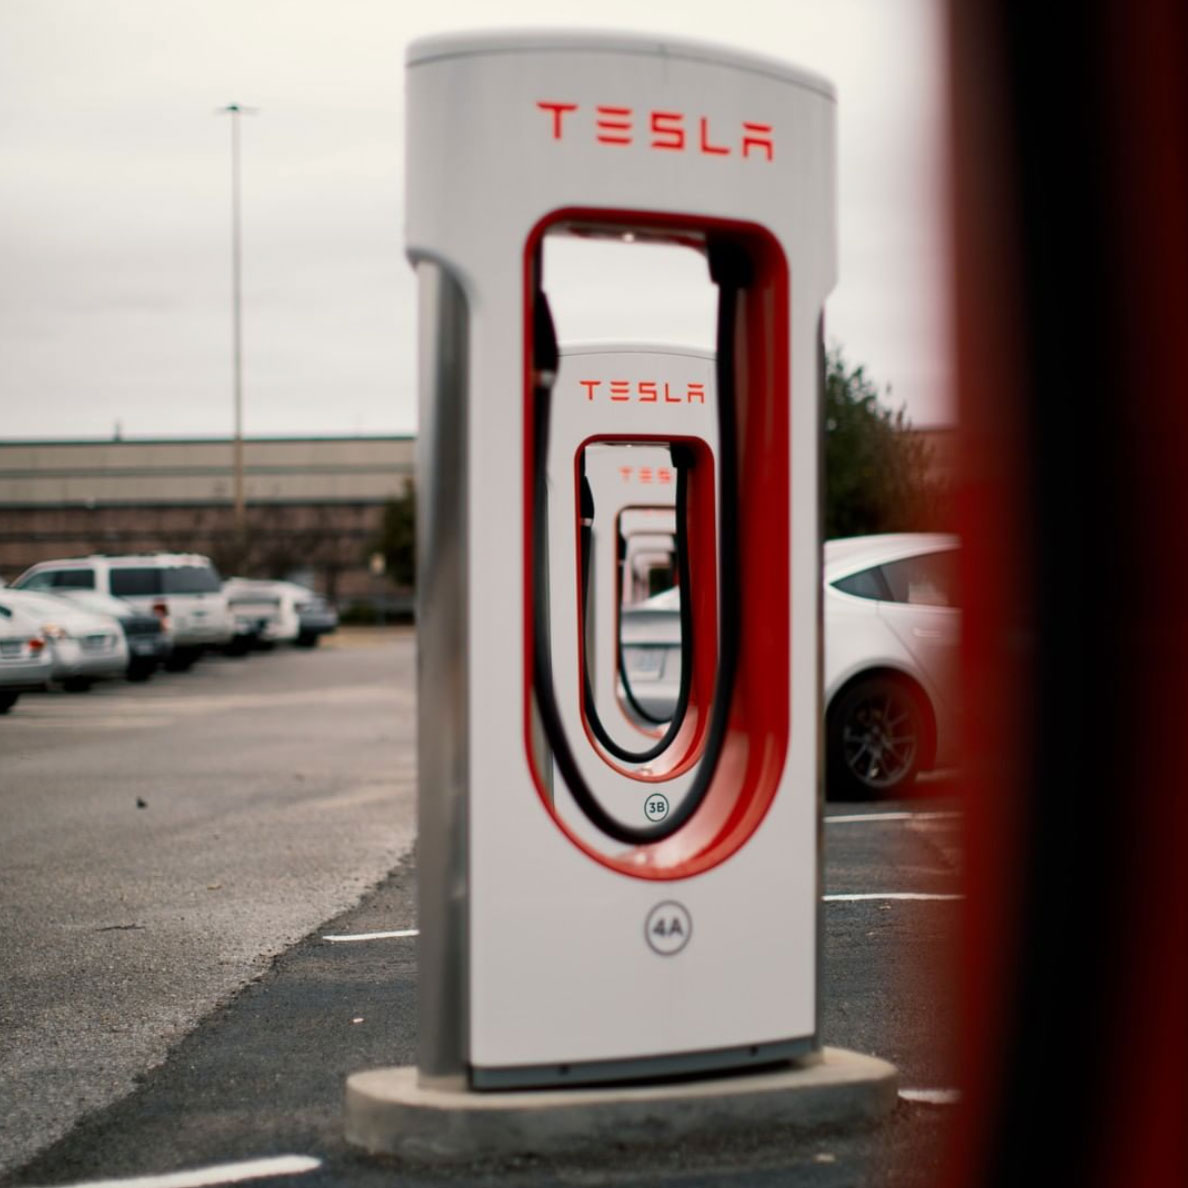 Tesla Supercharger in Meridian, MS